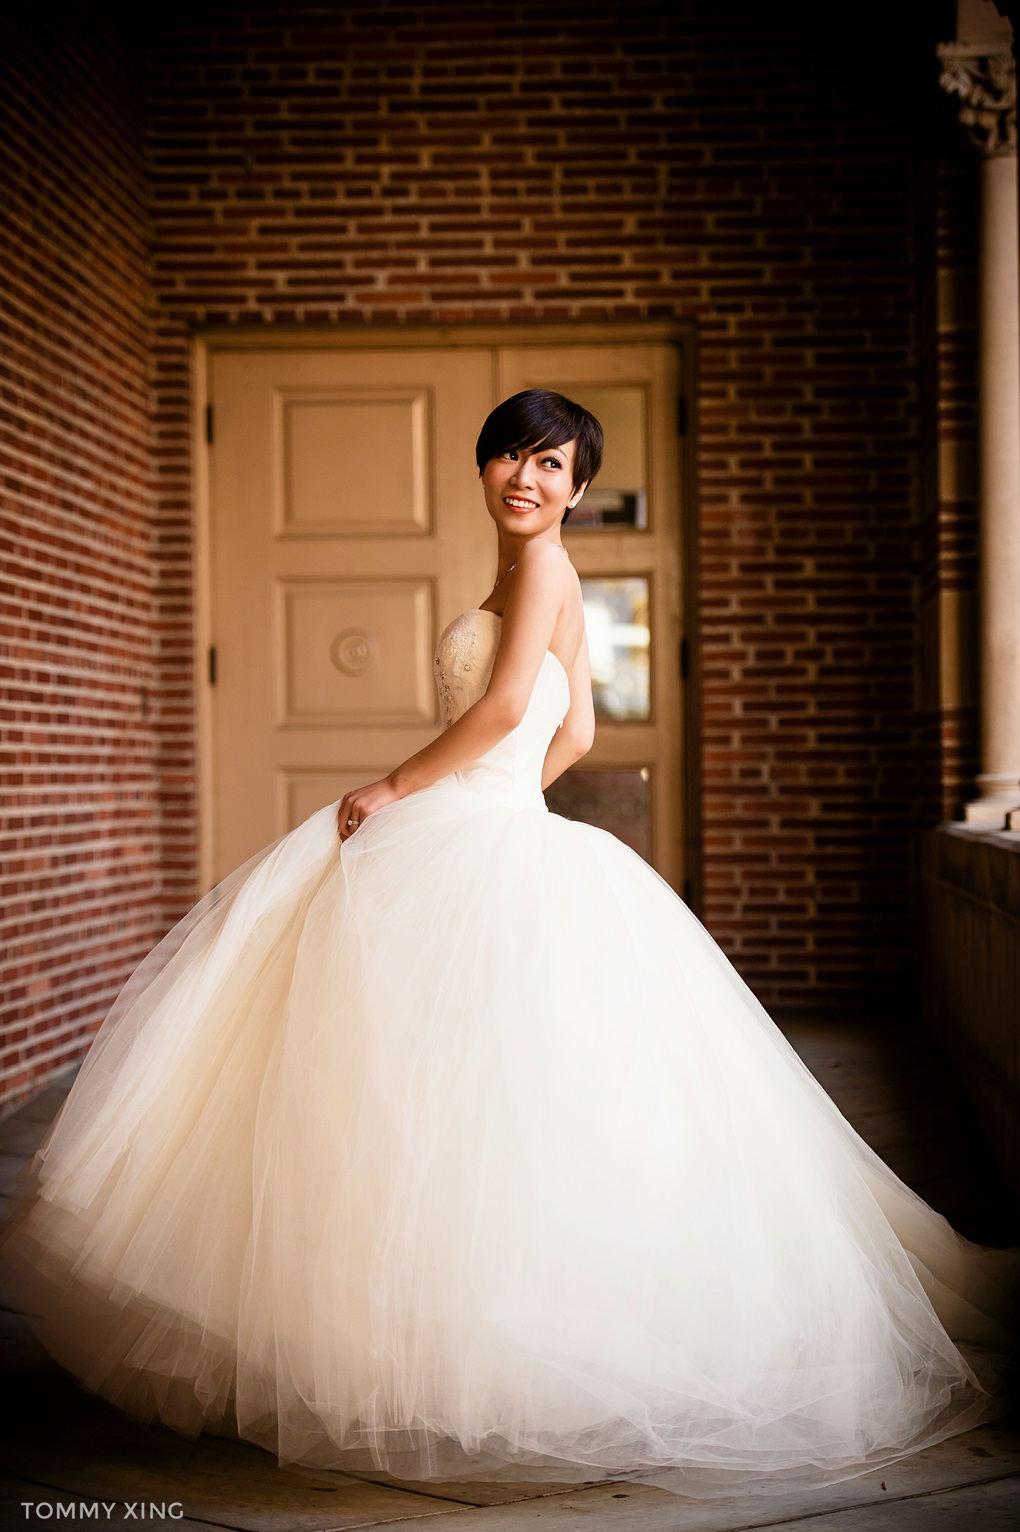 洛杉矶婚纱照 - Los Angeles Pre Wedding - Tommy Xing10.jpg